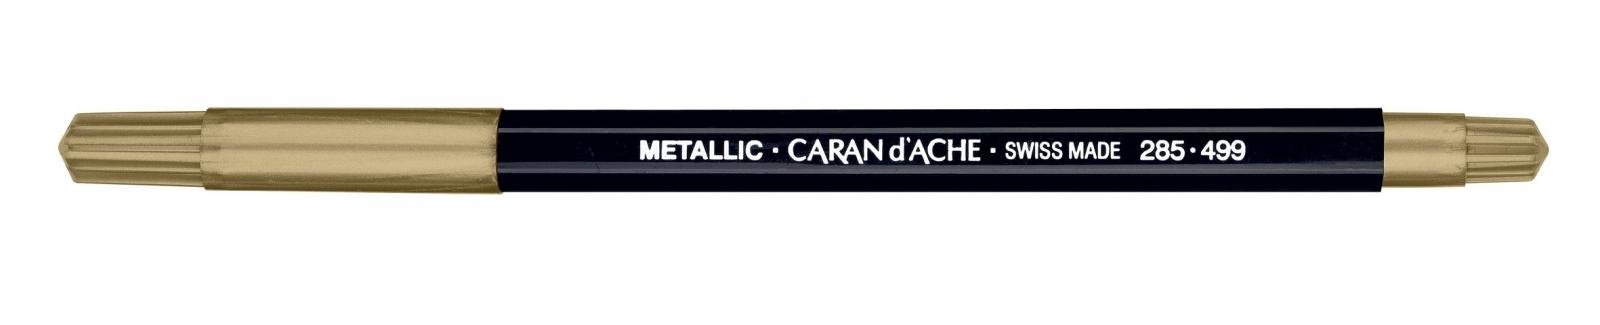 CANETA CARAN dACHE FANCOLOR METALICA OURO - Papelaria Botafogo